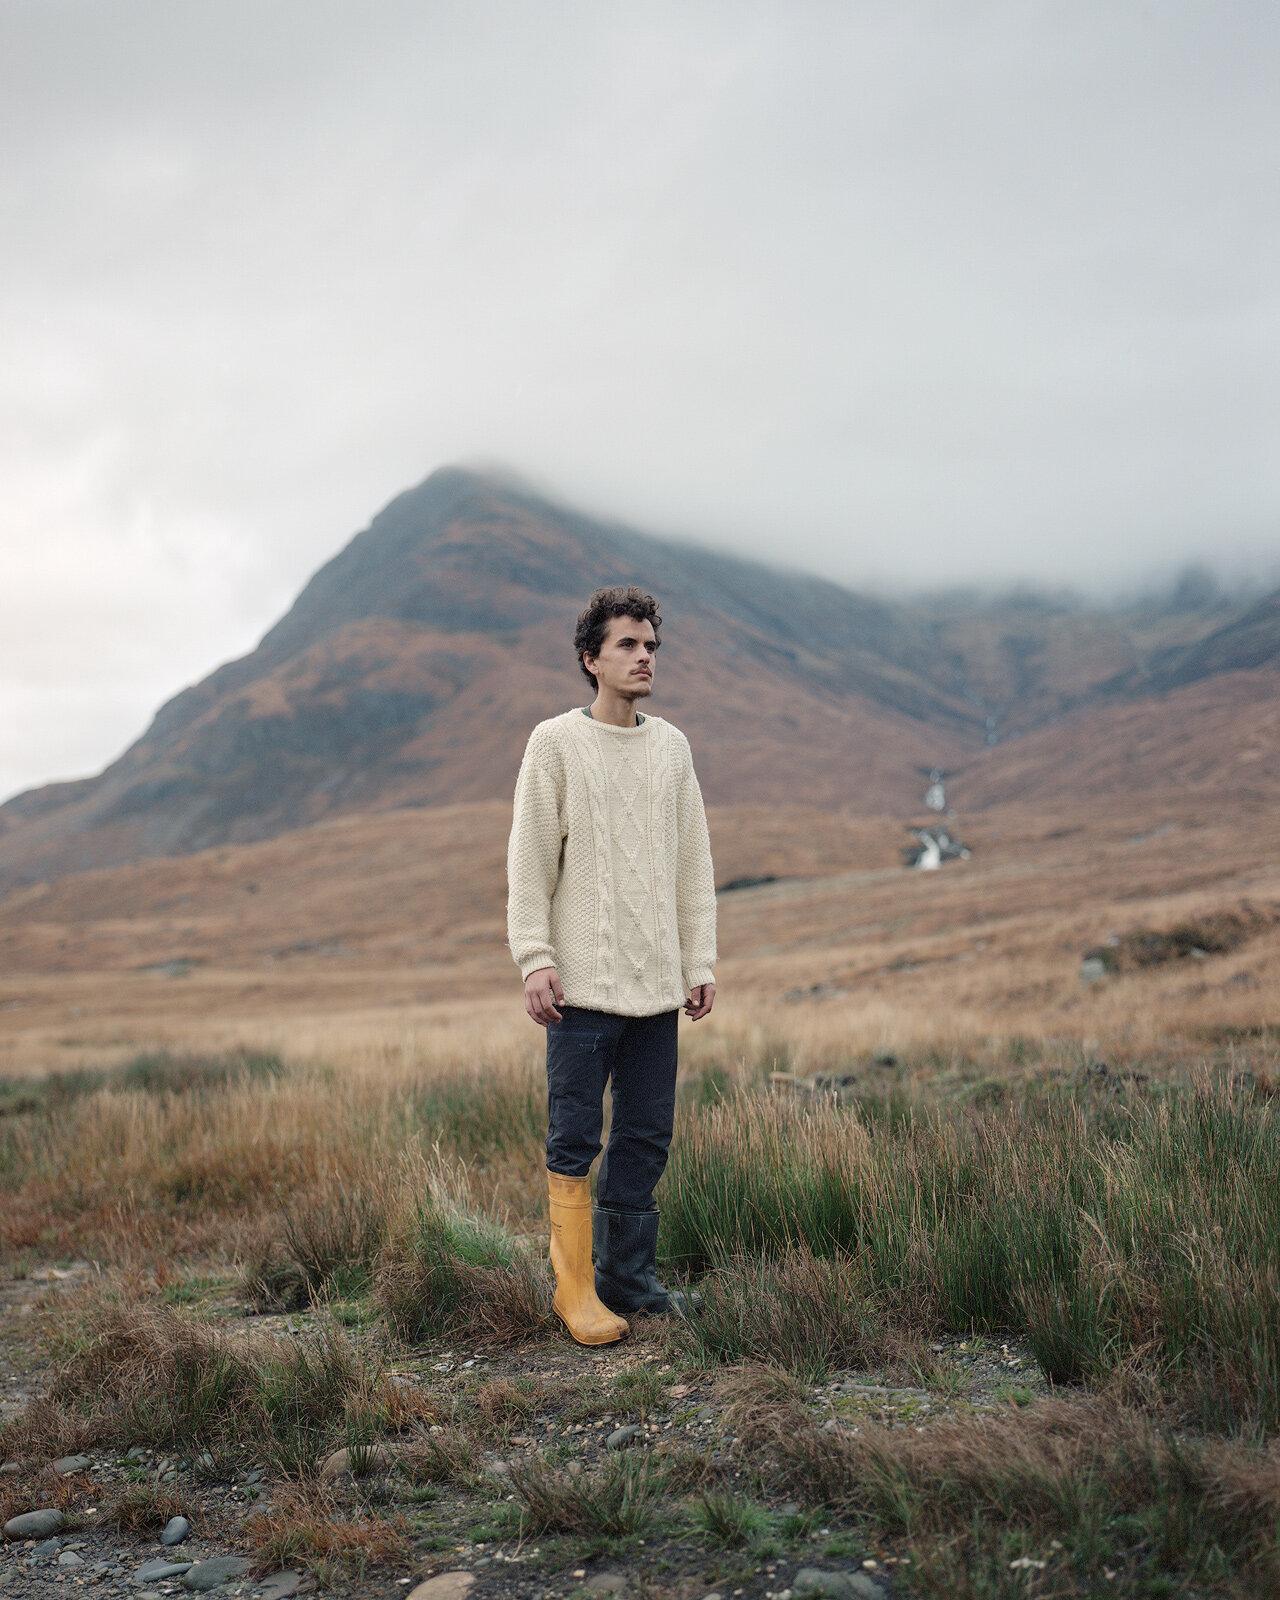 nicholaswhite_Giles at Camasunary Bothy, Isle of Skye, Scotland.jpg